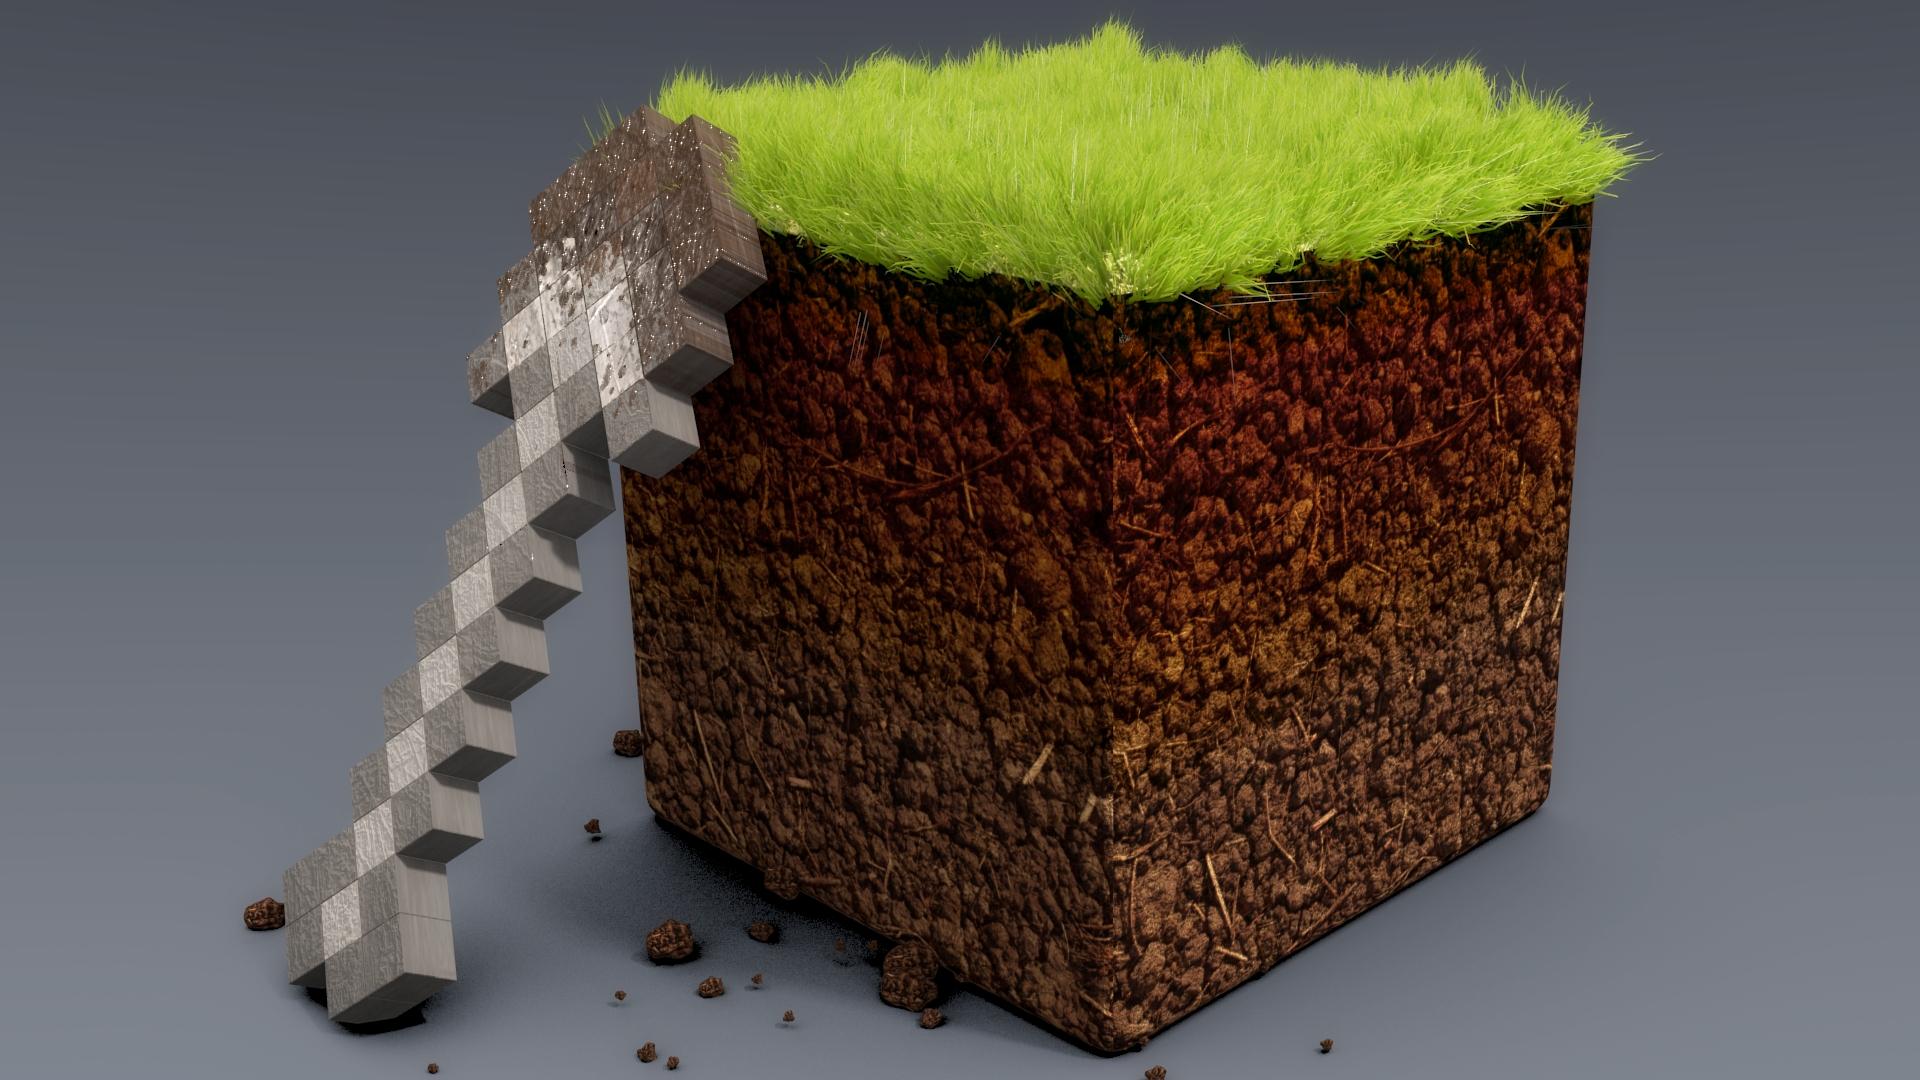 Realistic Minecraft Game HD Wallpaper 4742 HD Wallpaper 3D 1920x1080